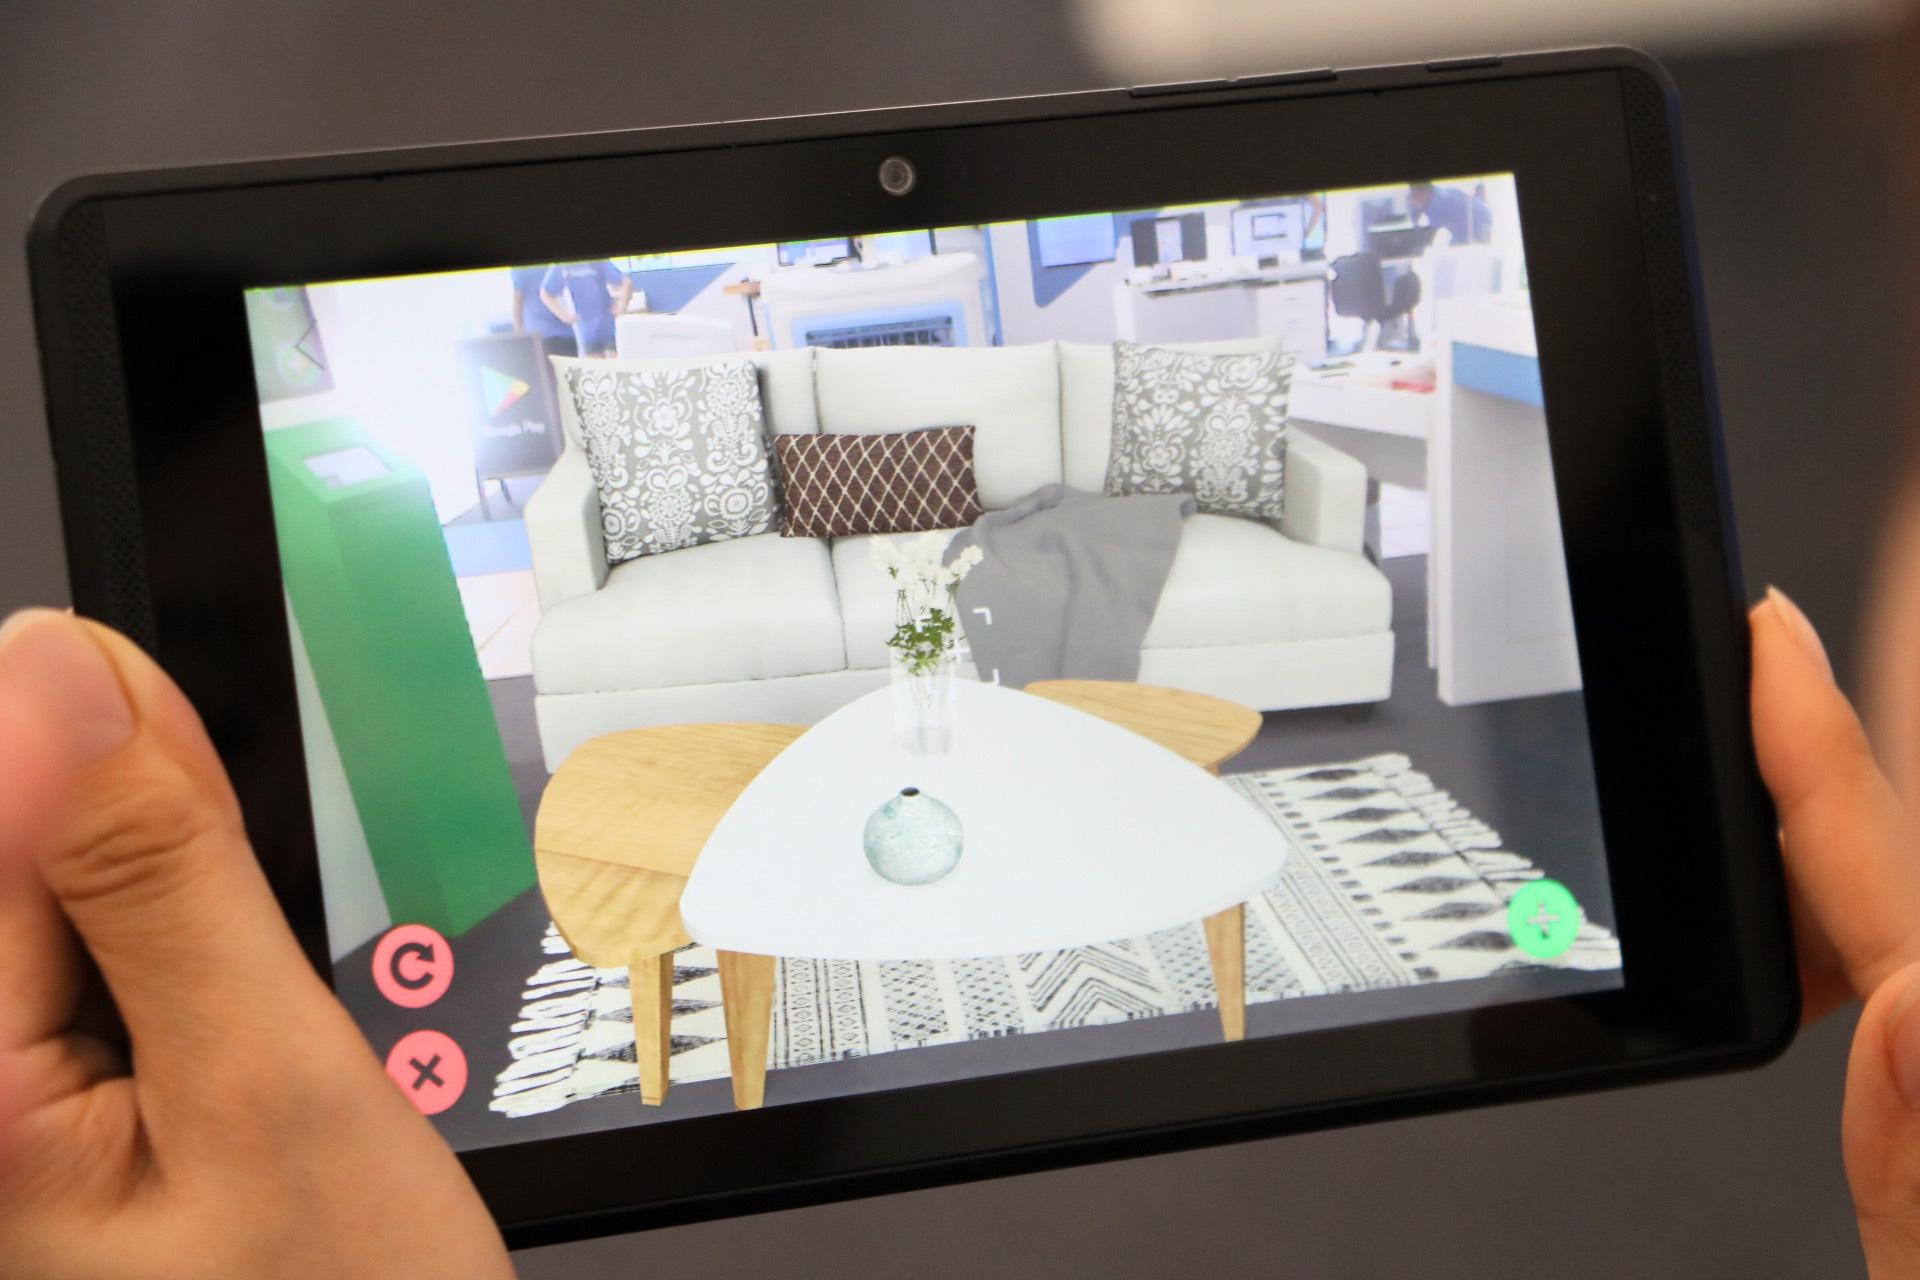 Google Project Tango技術怎麼用?iStaging讓你在家模擬家具擺設還可以丈量尺寸